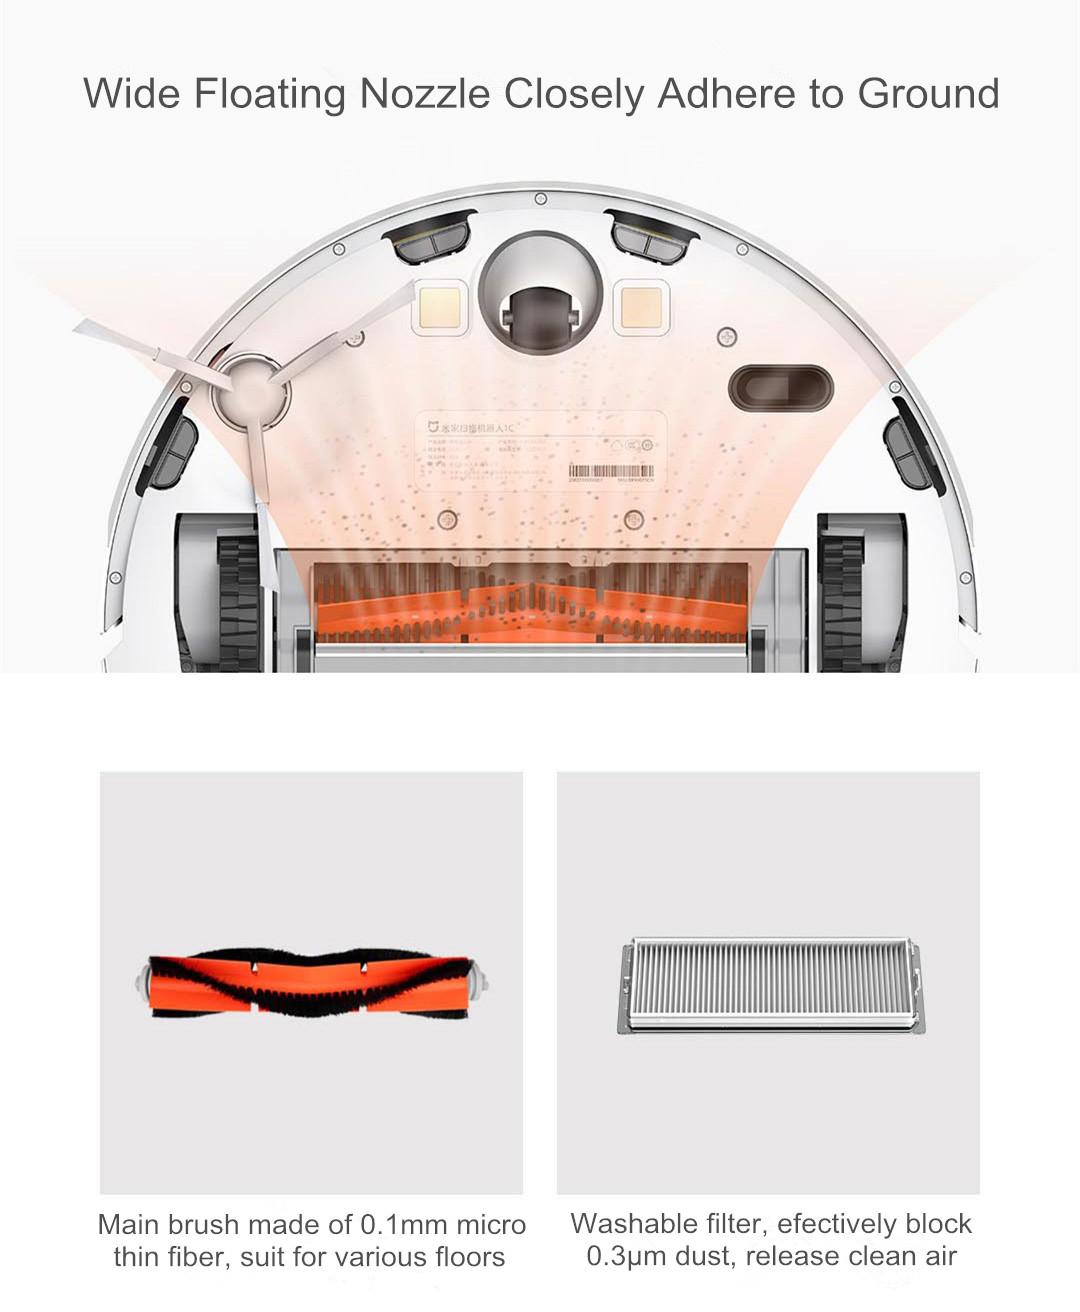 xiaomi-mi-robot-vacuum-Mop-12.jpg (182 KB)